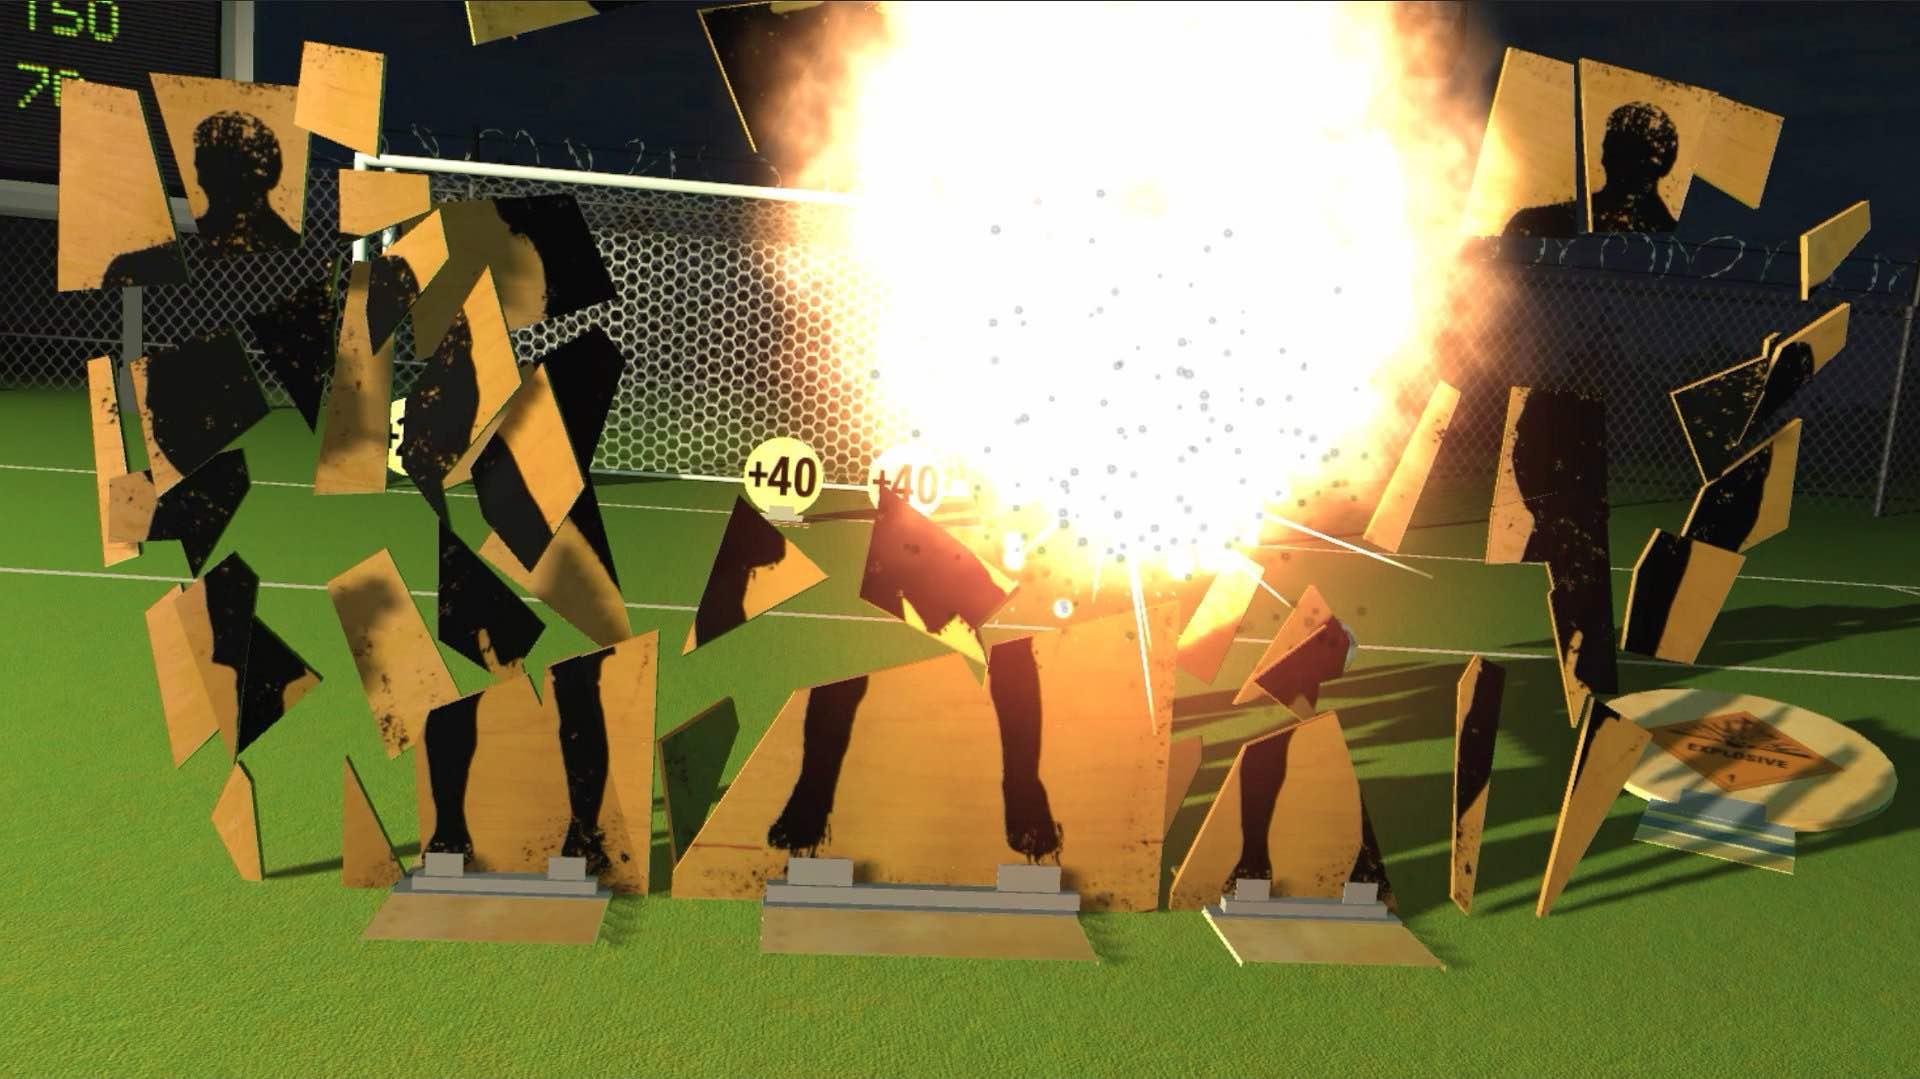 Headmaster explosivo